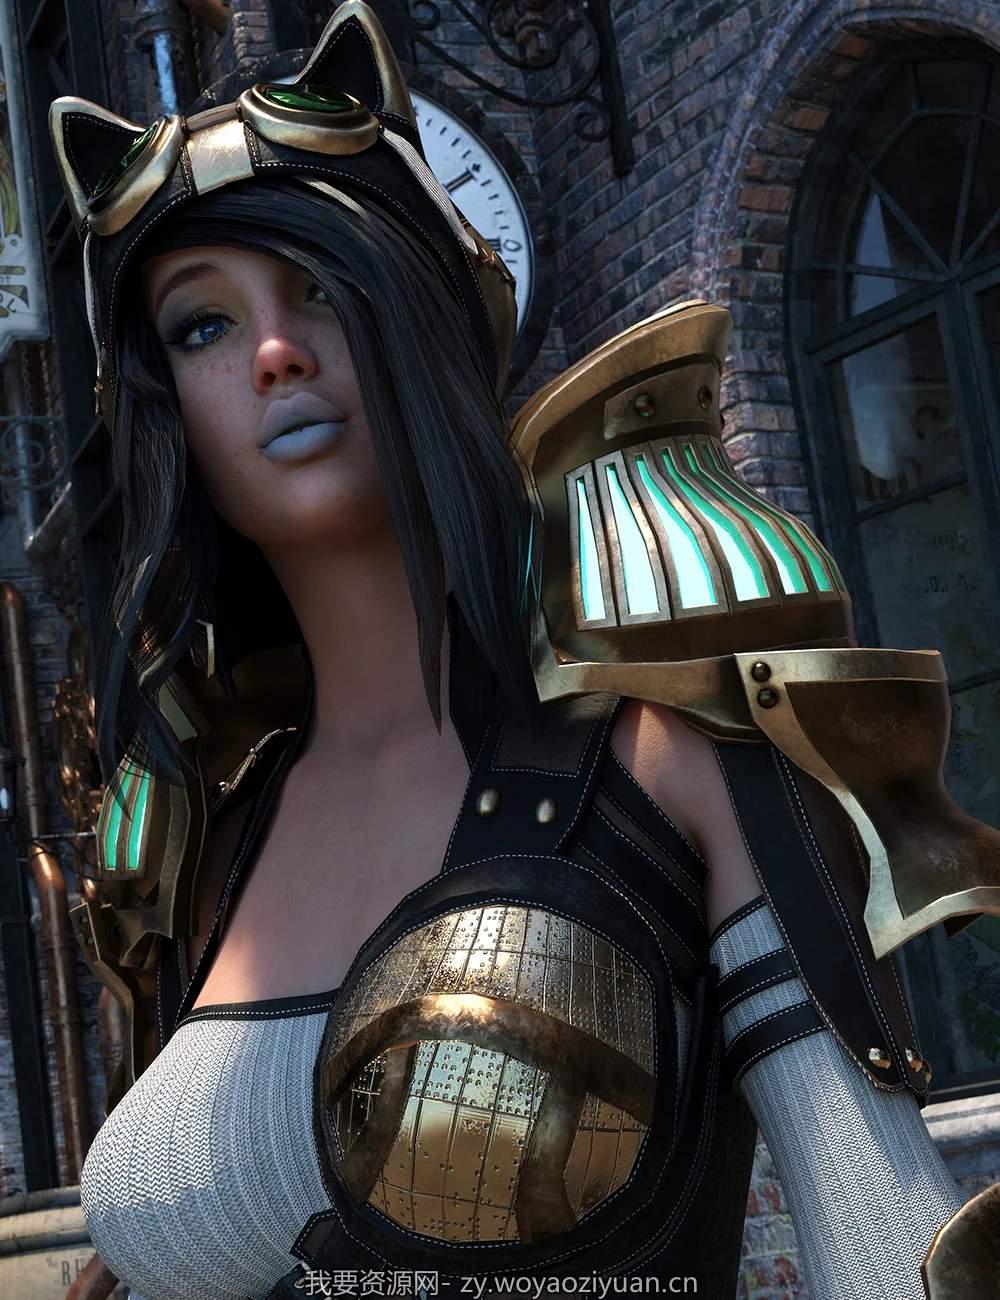 dForce Lynx Steampunk Armor for Genesis 8.1 Females